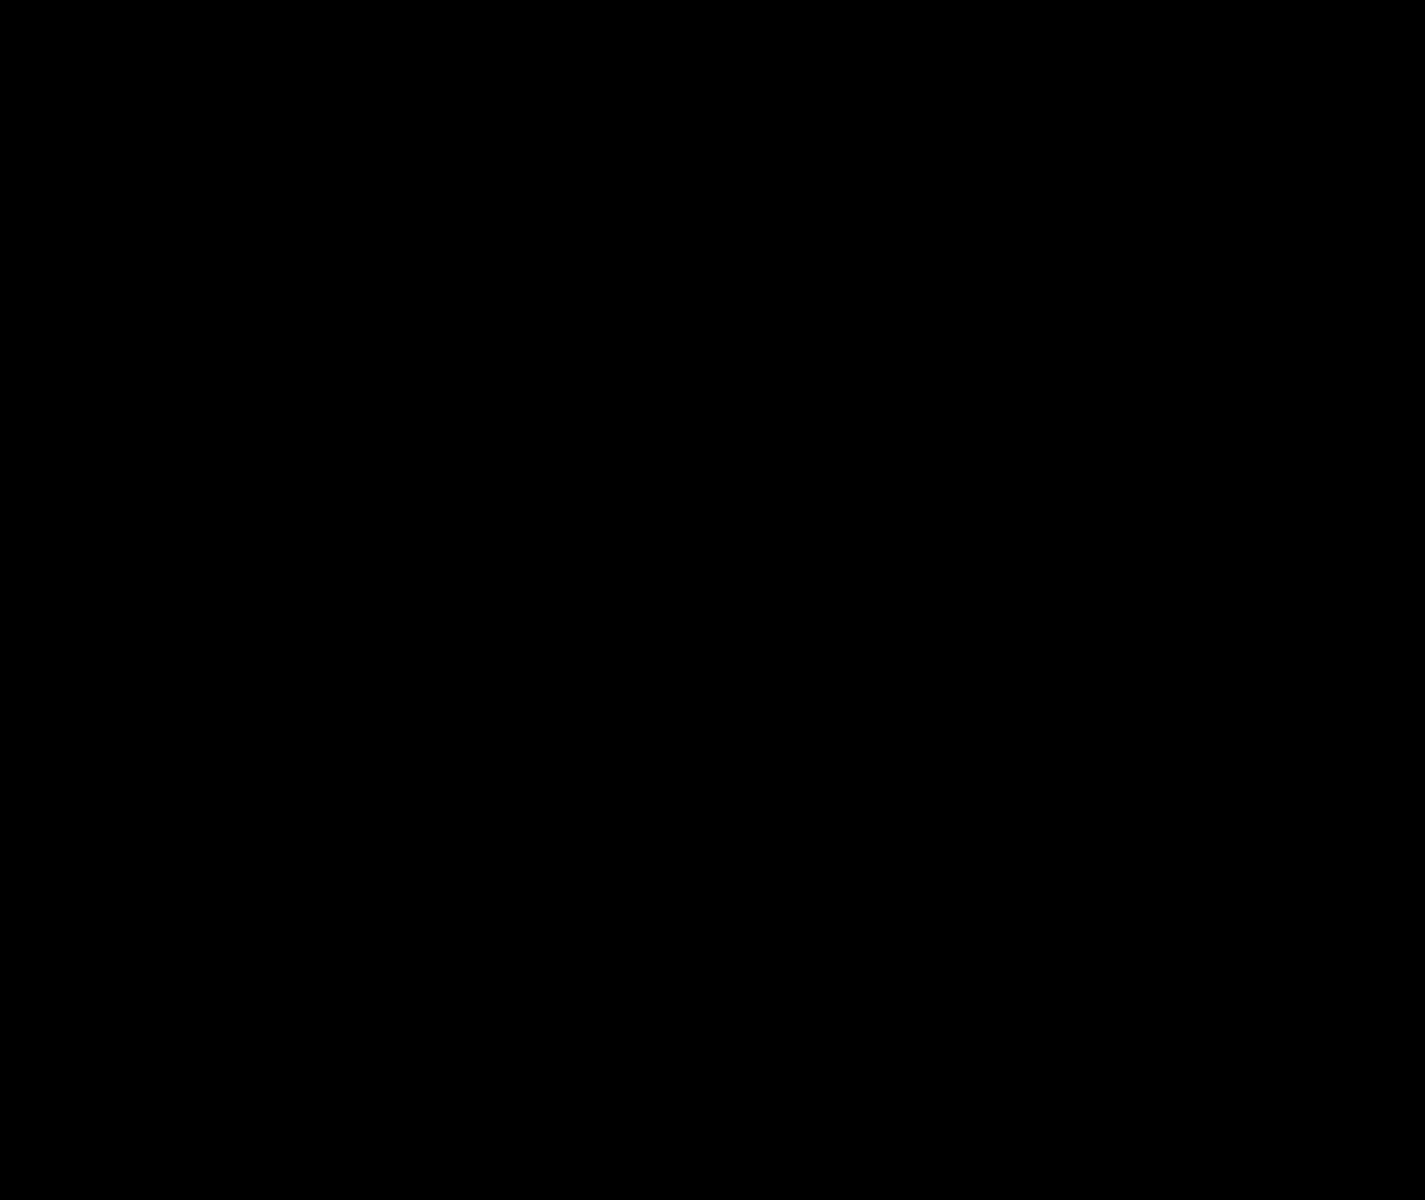 kfx logo